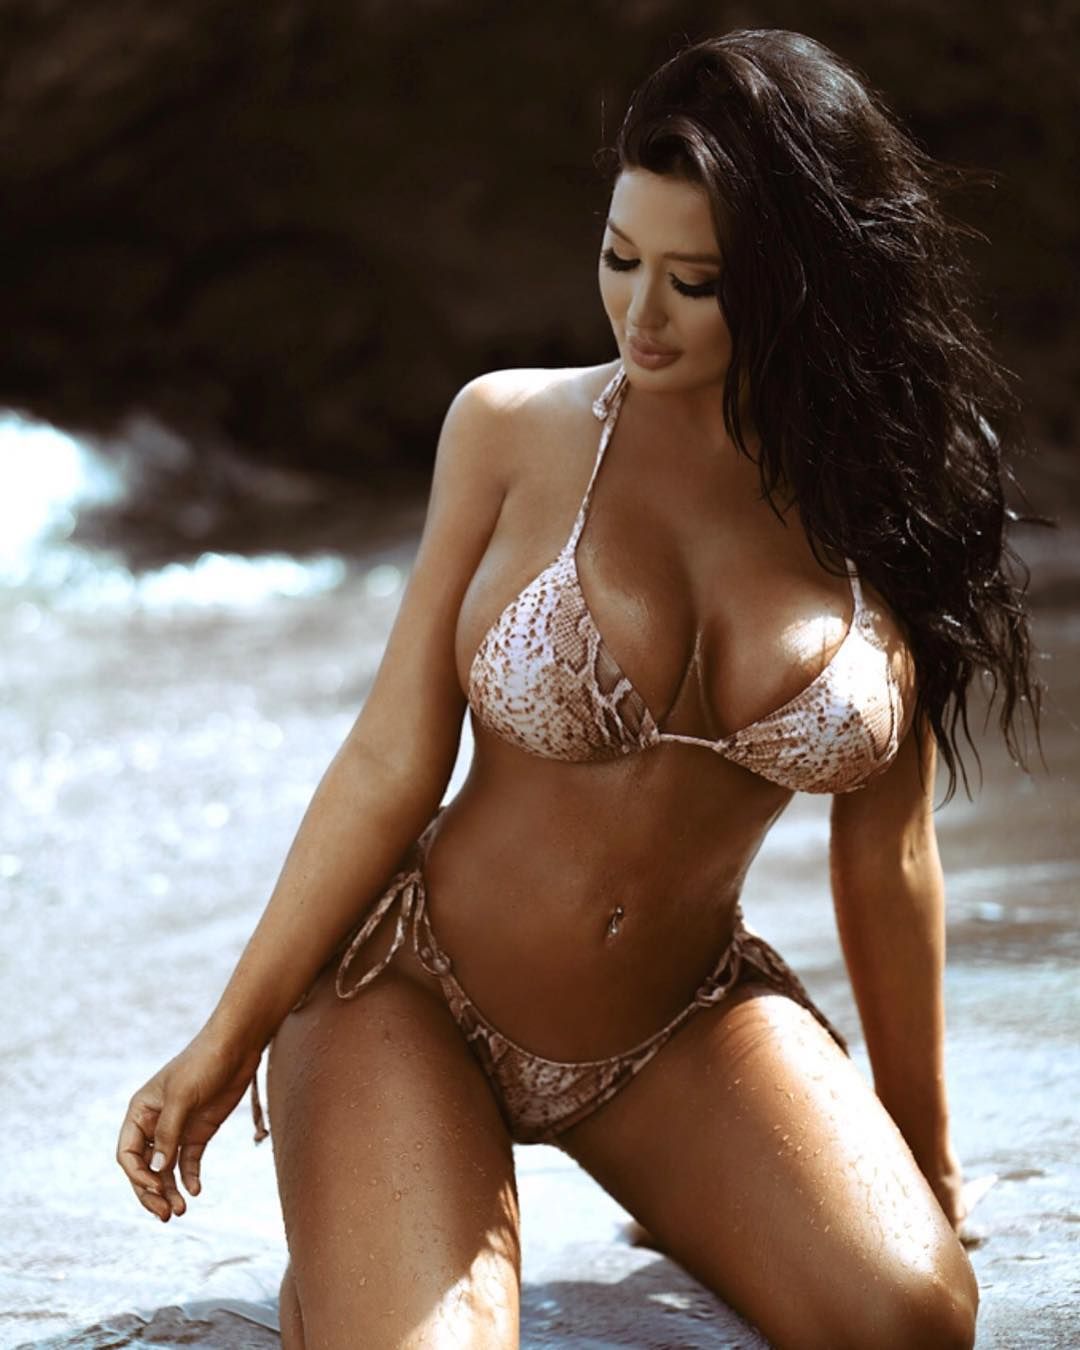 Becky Hudson big titties sexy girl (4)